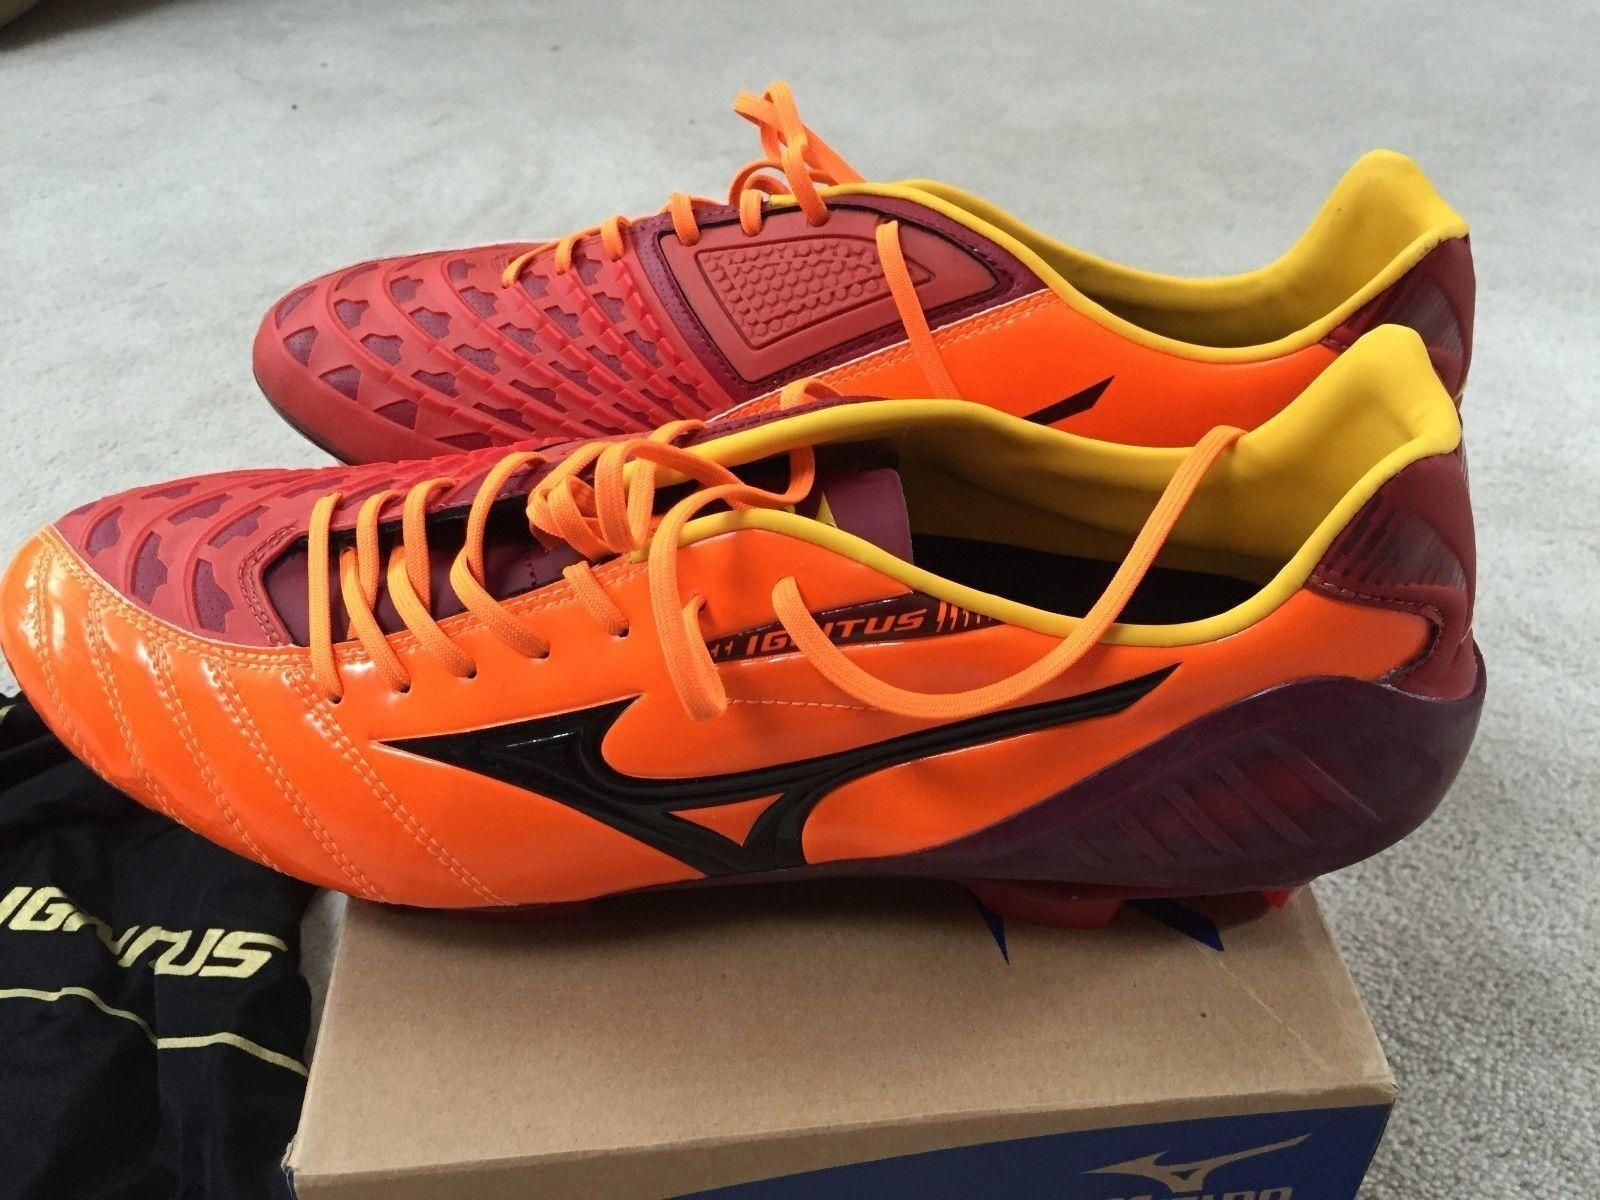 Mizuno Wave Ignitus 3 MD Soccer Shoes, Size 11, Maestri, Vap